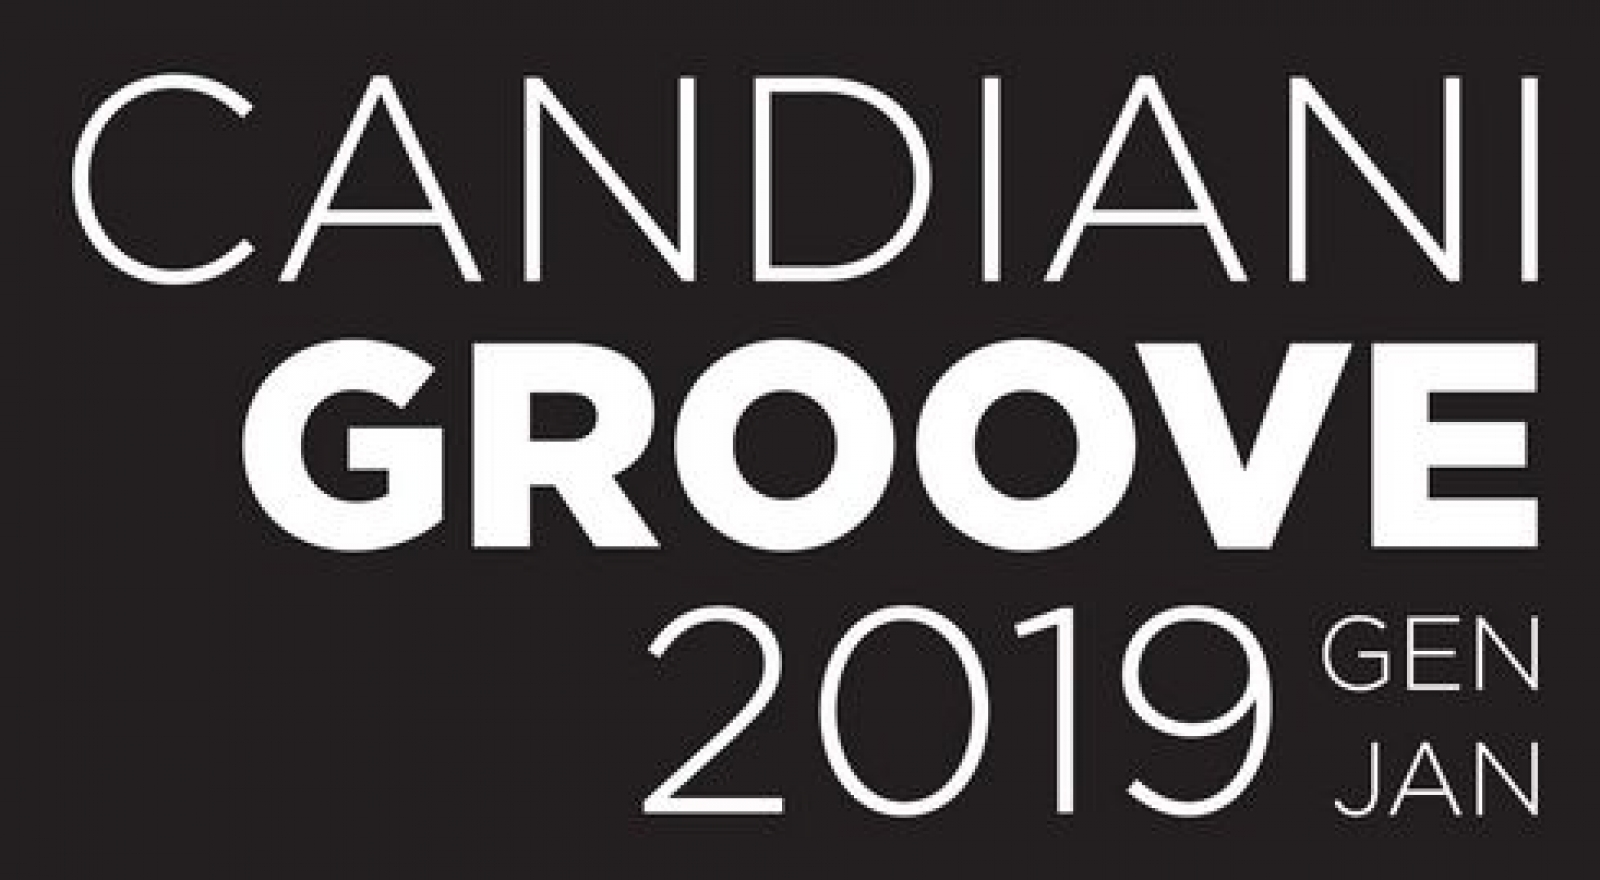 Candiani Groove gennaio 2019